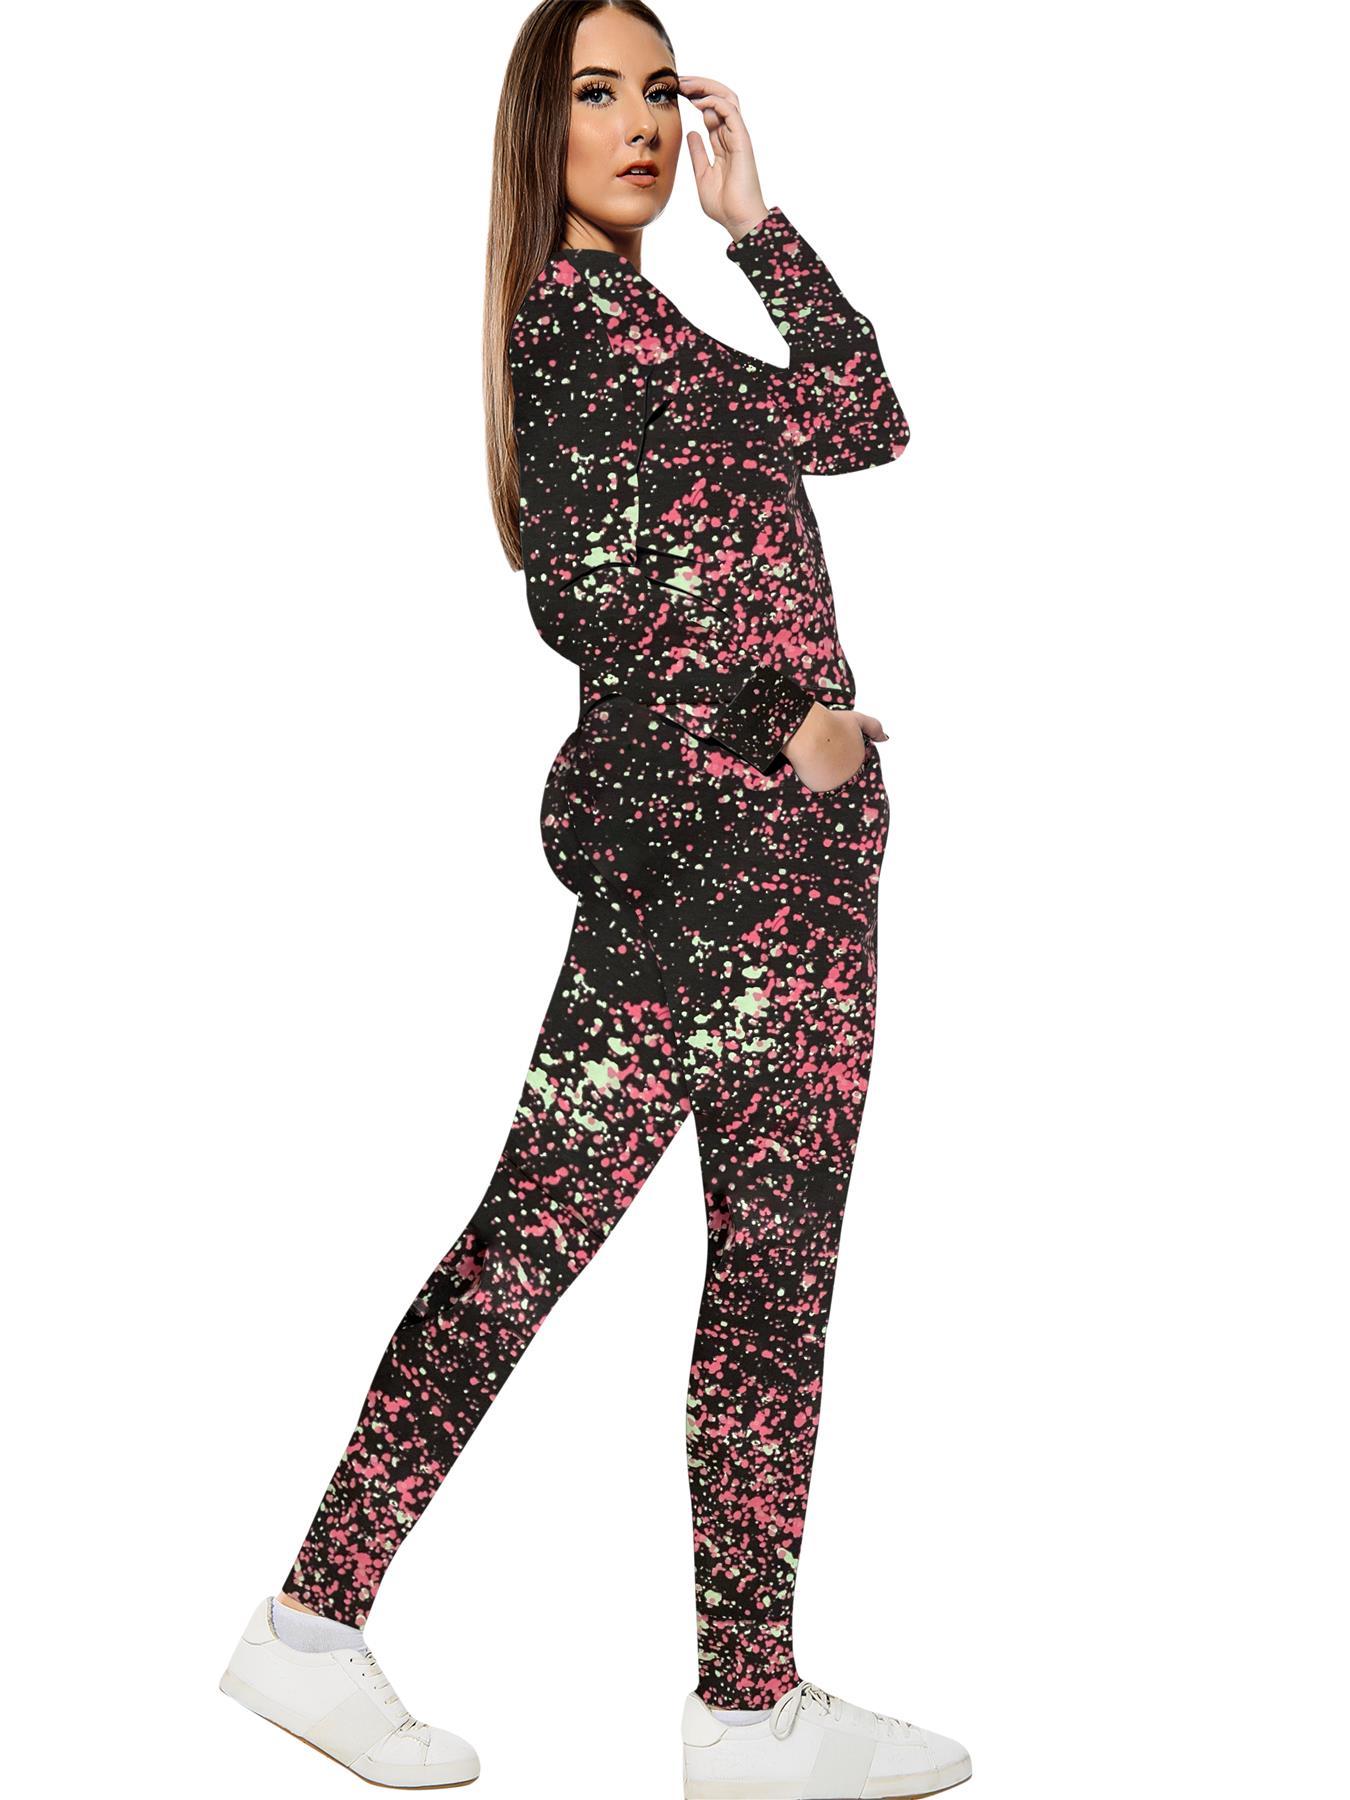 Details about  /Womens Ladies Long Sleeve Plain Lounge Wear Set Casual Comfy Two Piece Tracksuit